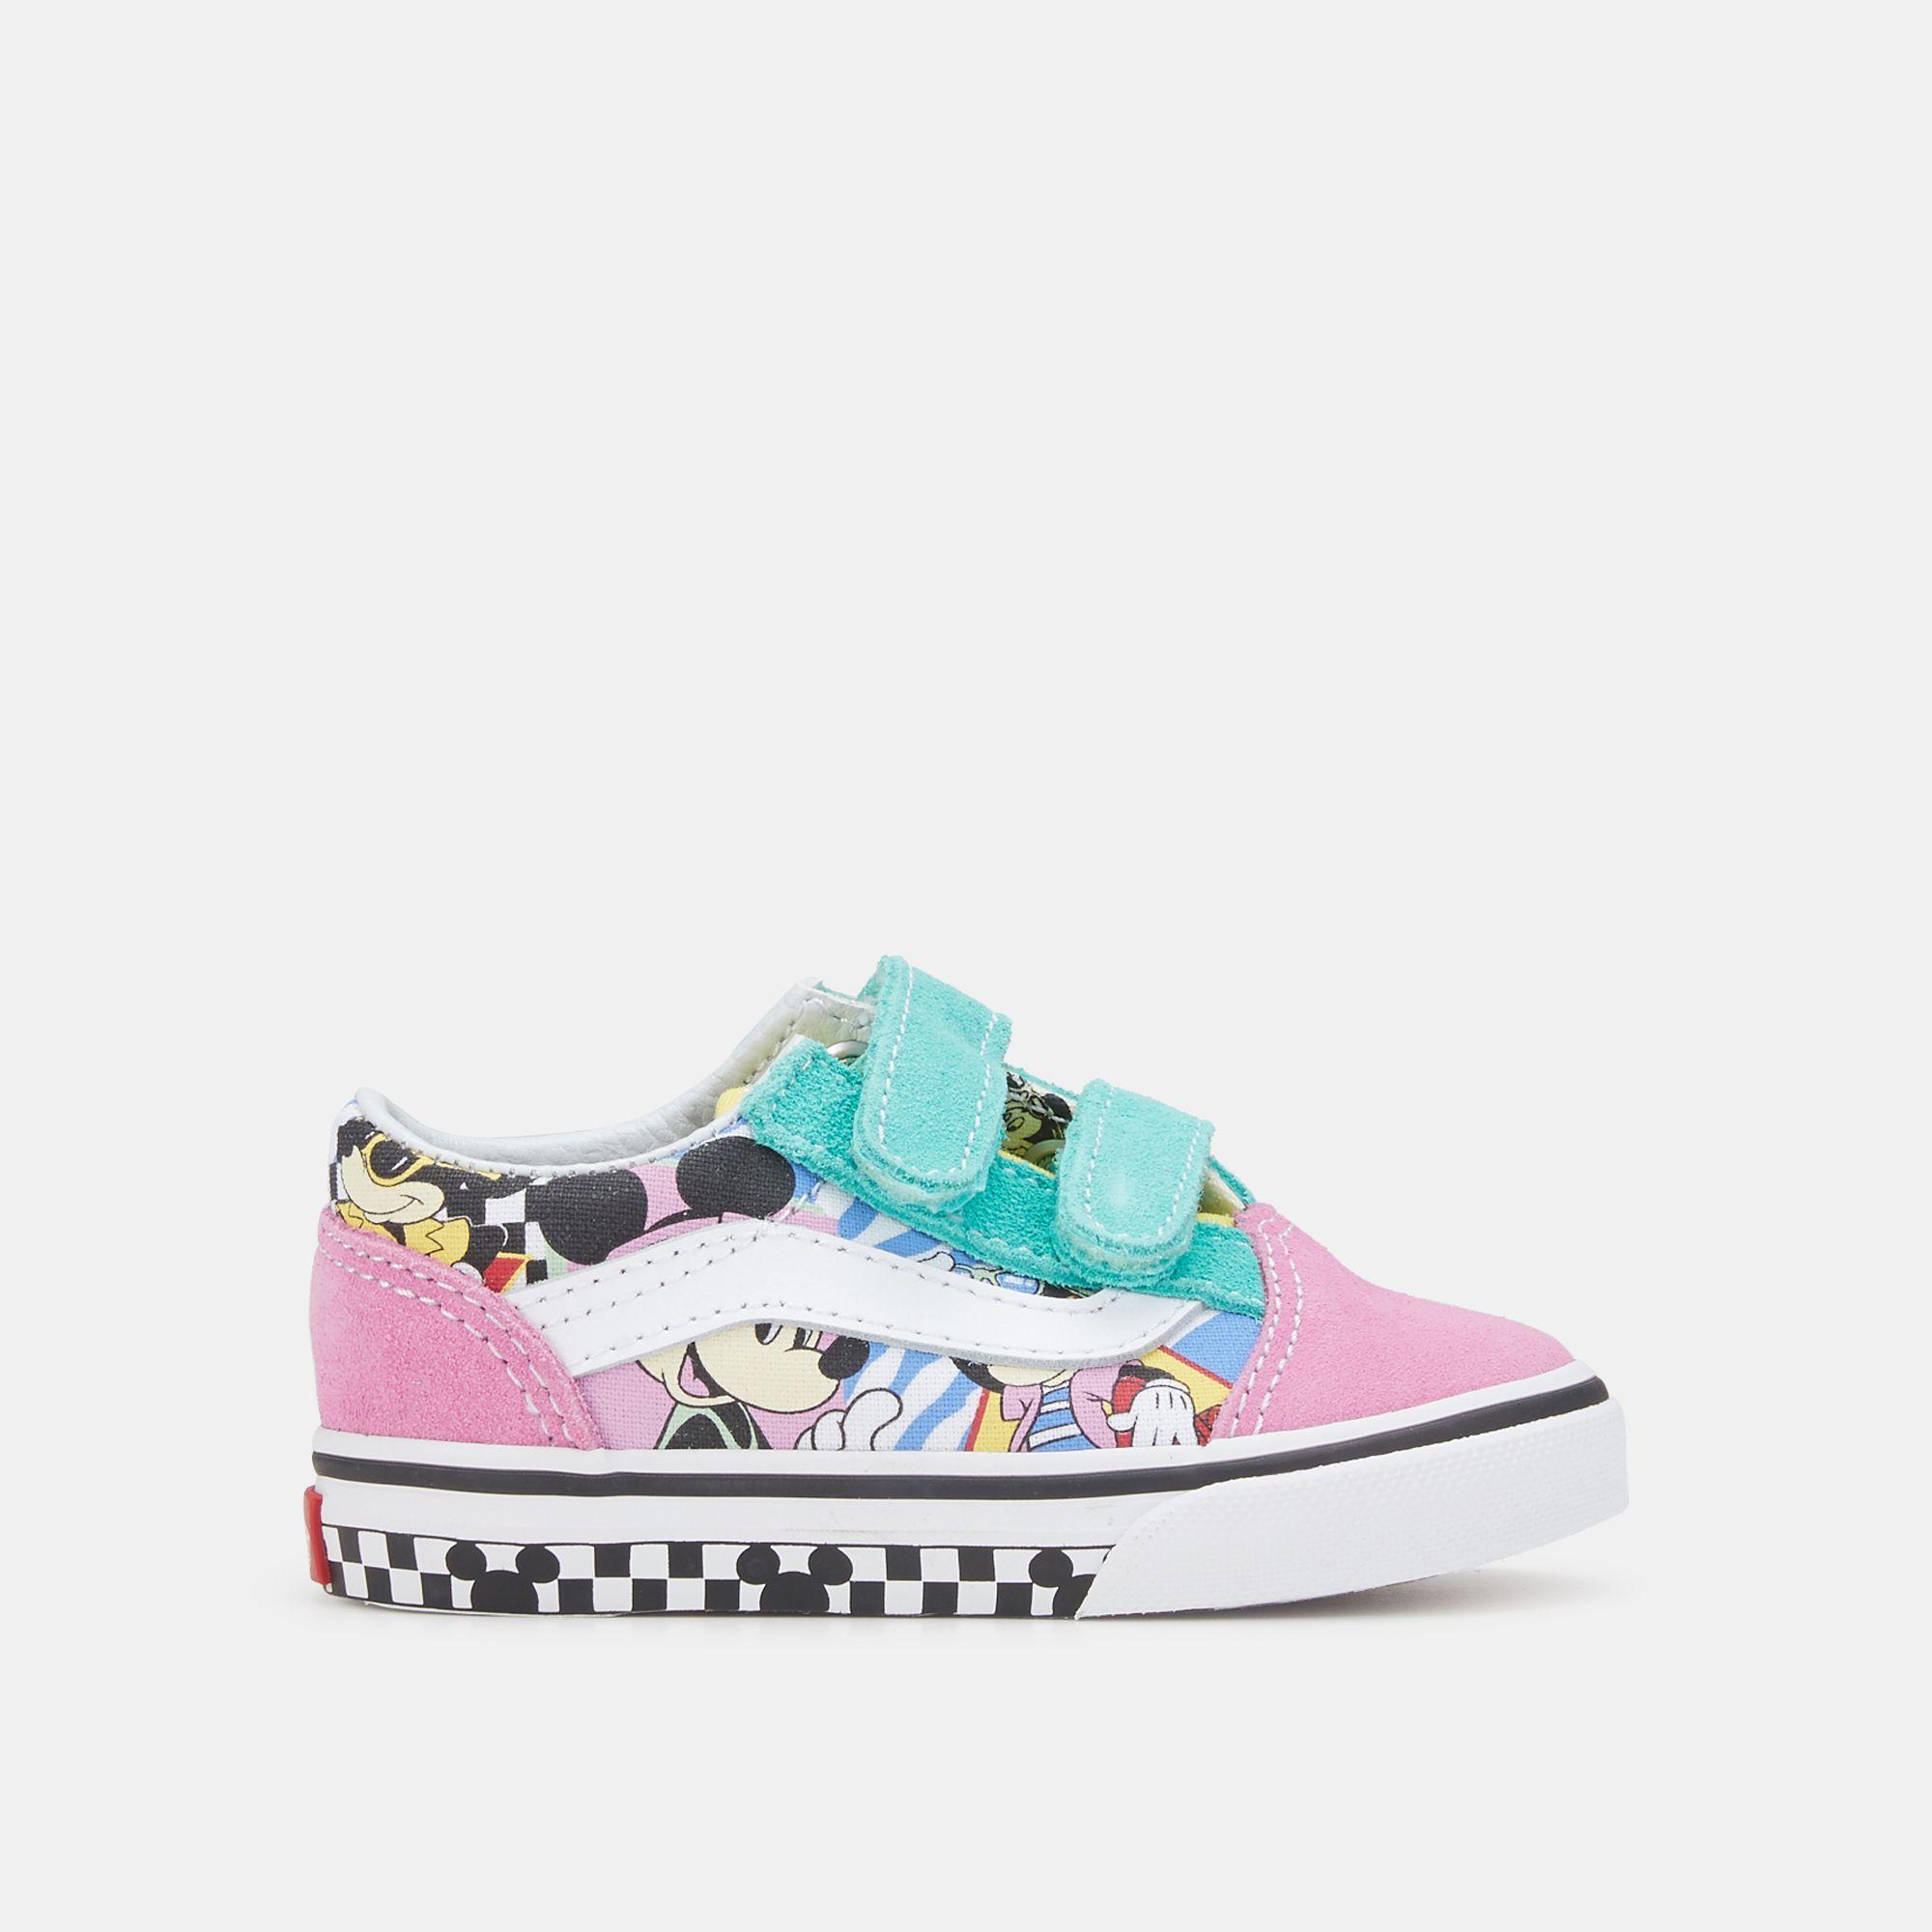 7145507b505 Vans Kids  x Disney Mickey Mouse Old Skool V Shoe